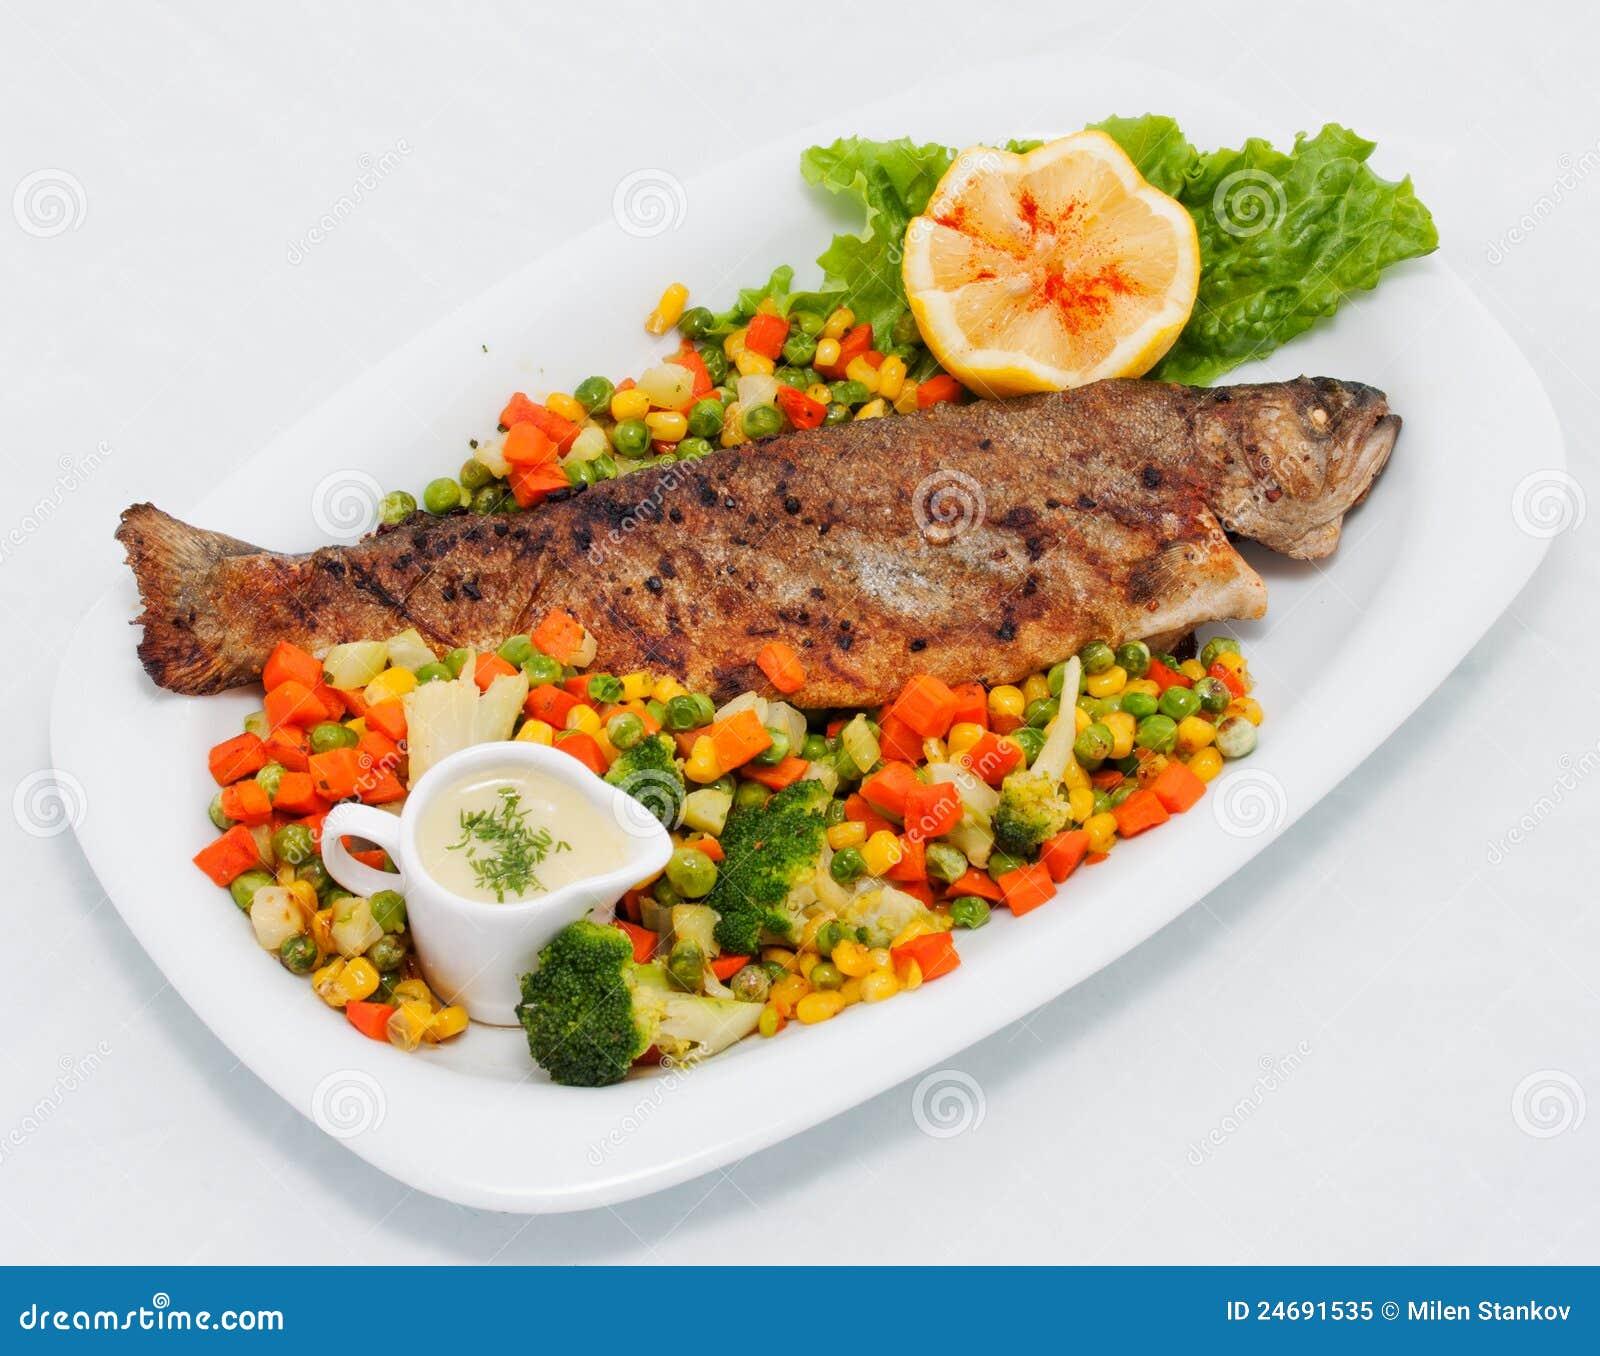 grilled salmon lemon